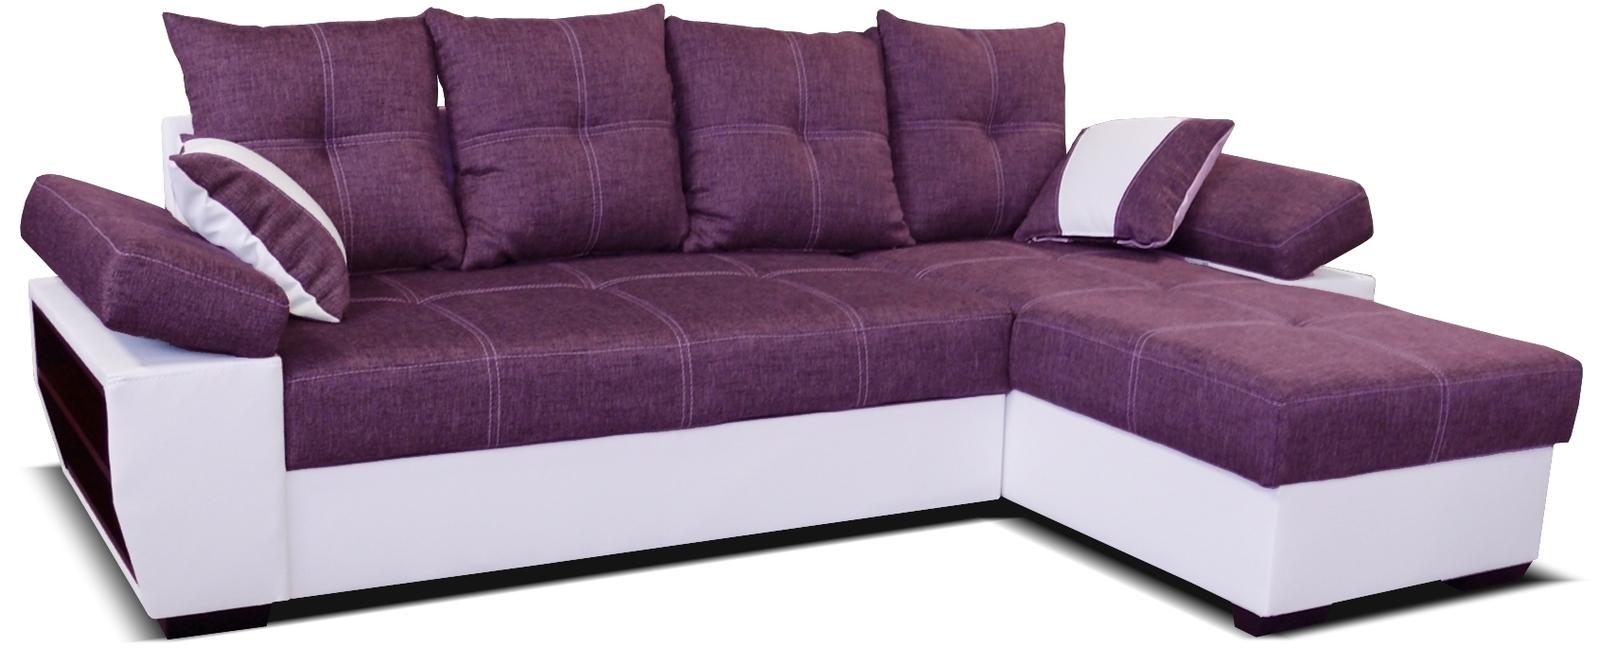 Rohová sedací souprava - Po-Sed - Viena 2F+L (P) bílá + fialová